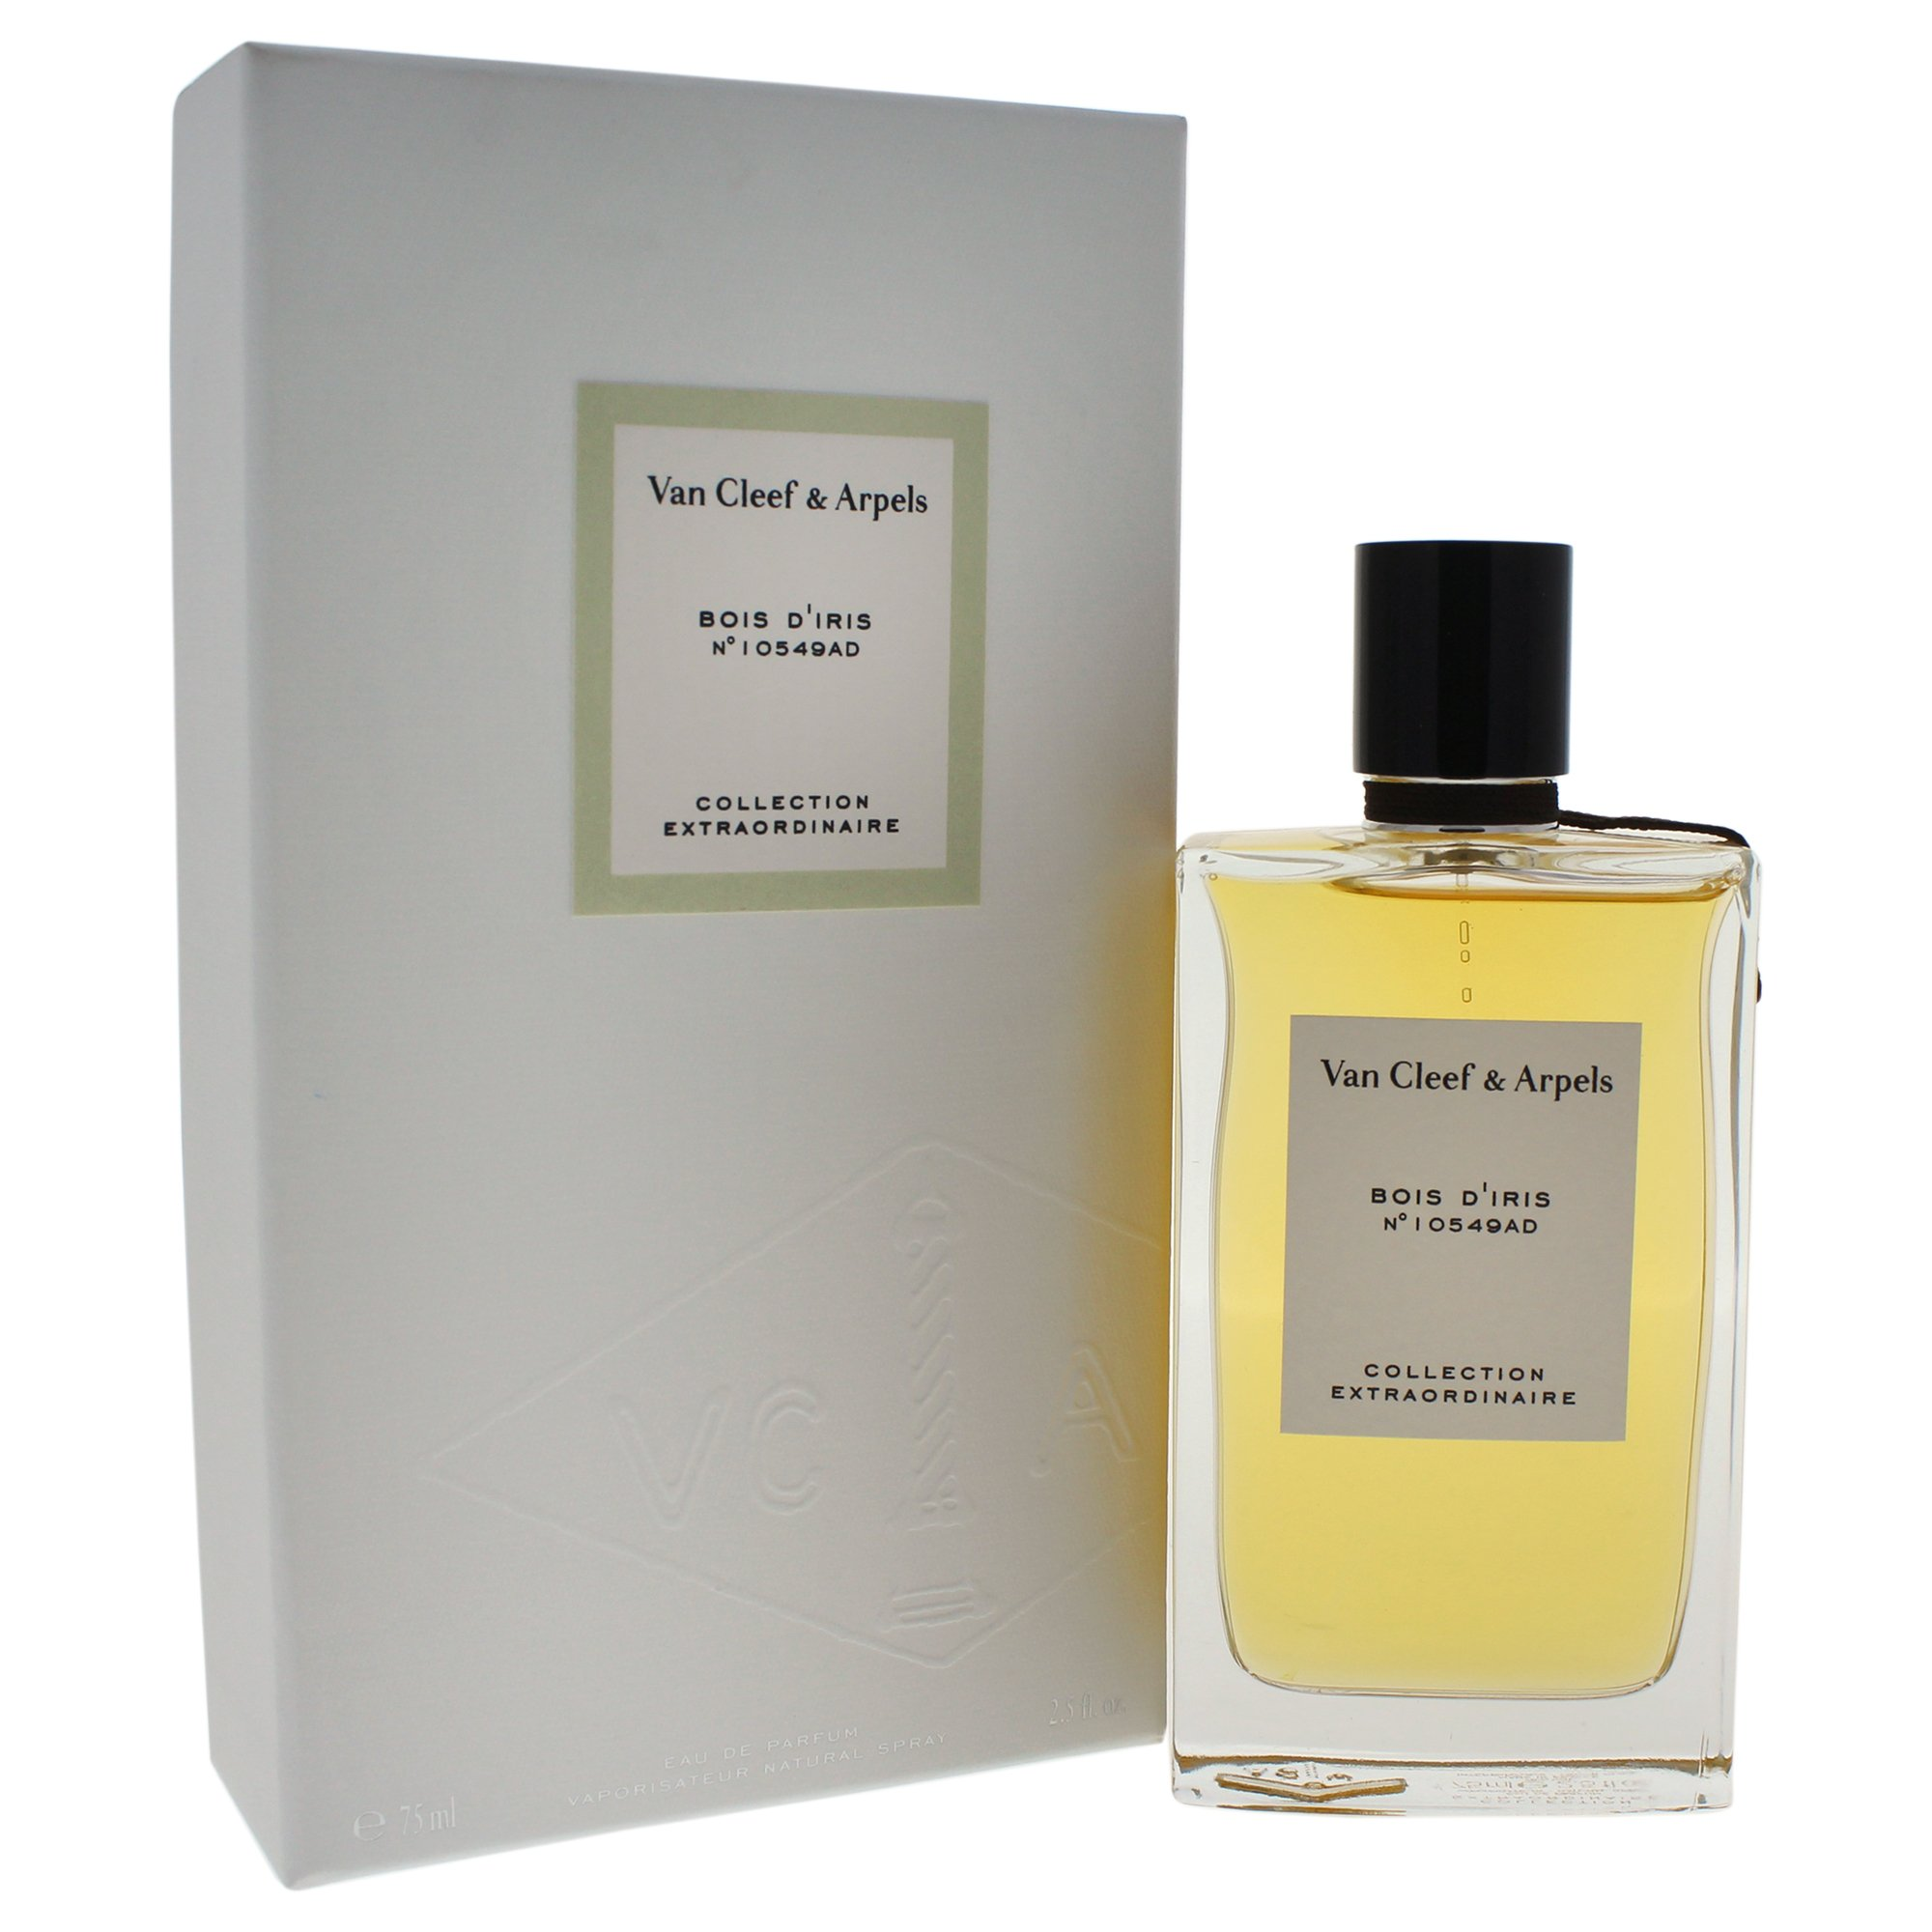 Van Cleef & Arpels Collection Extraordinaire Bois d ' IRIS Eau de Parfum spray 75 ml